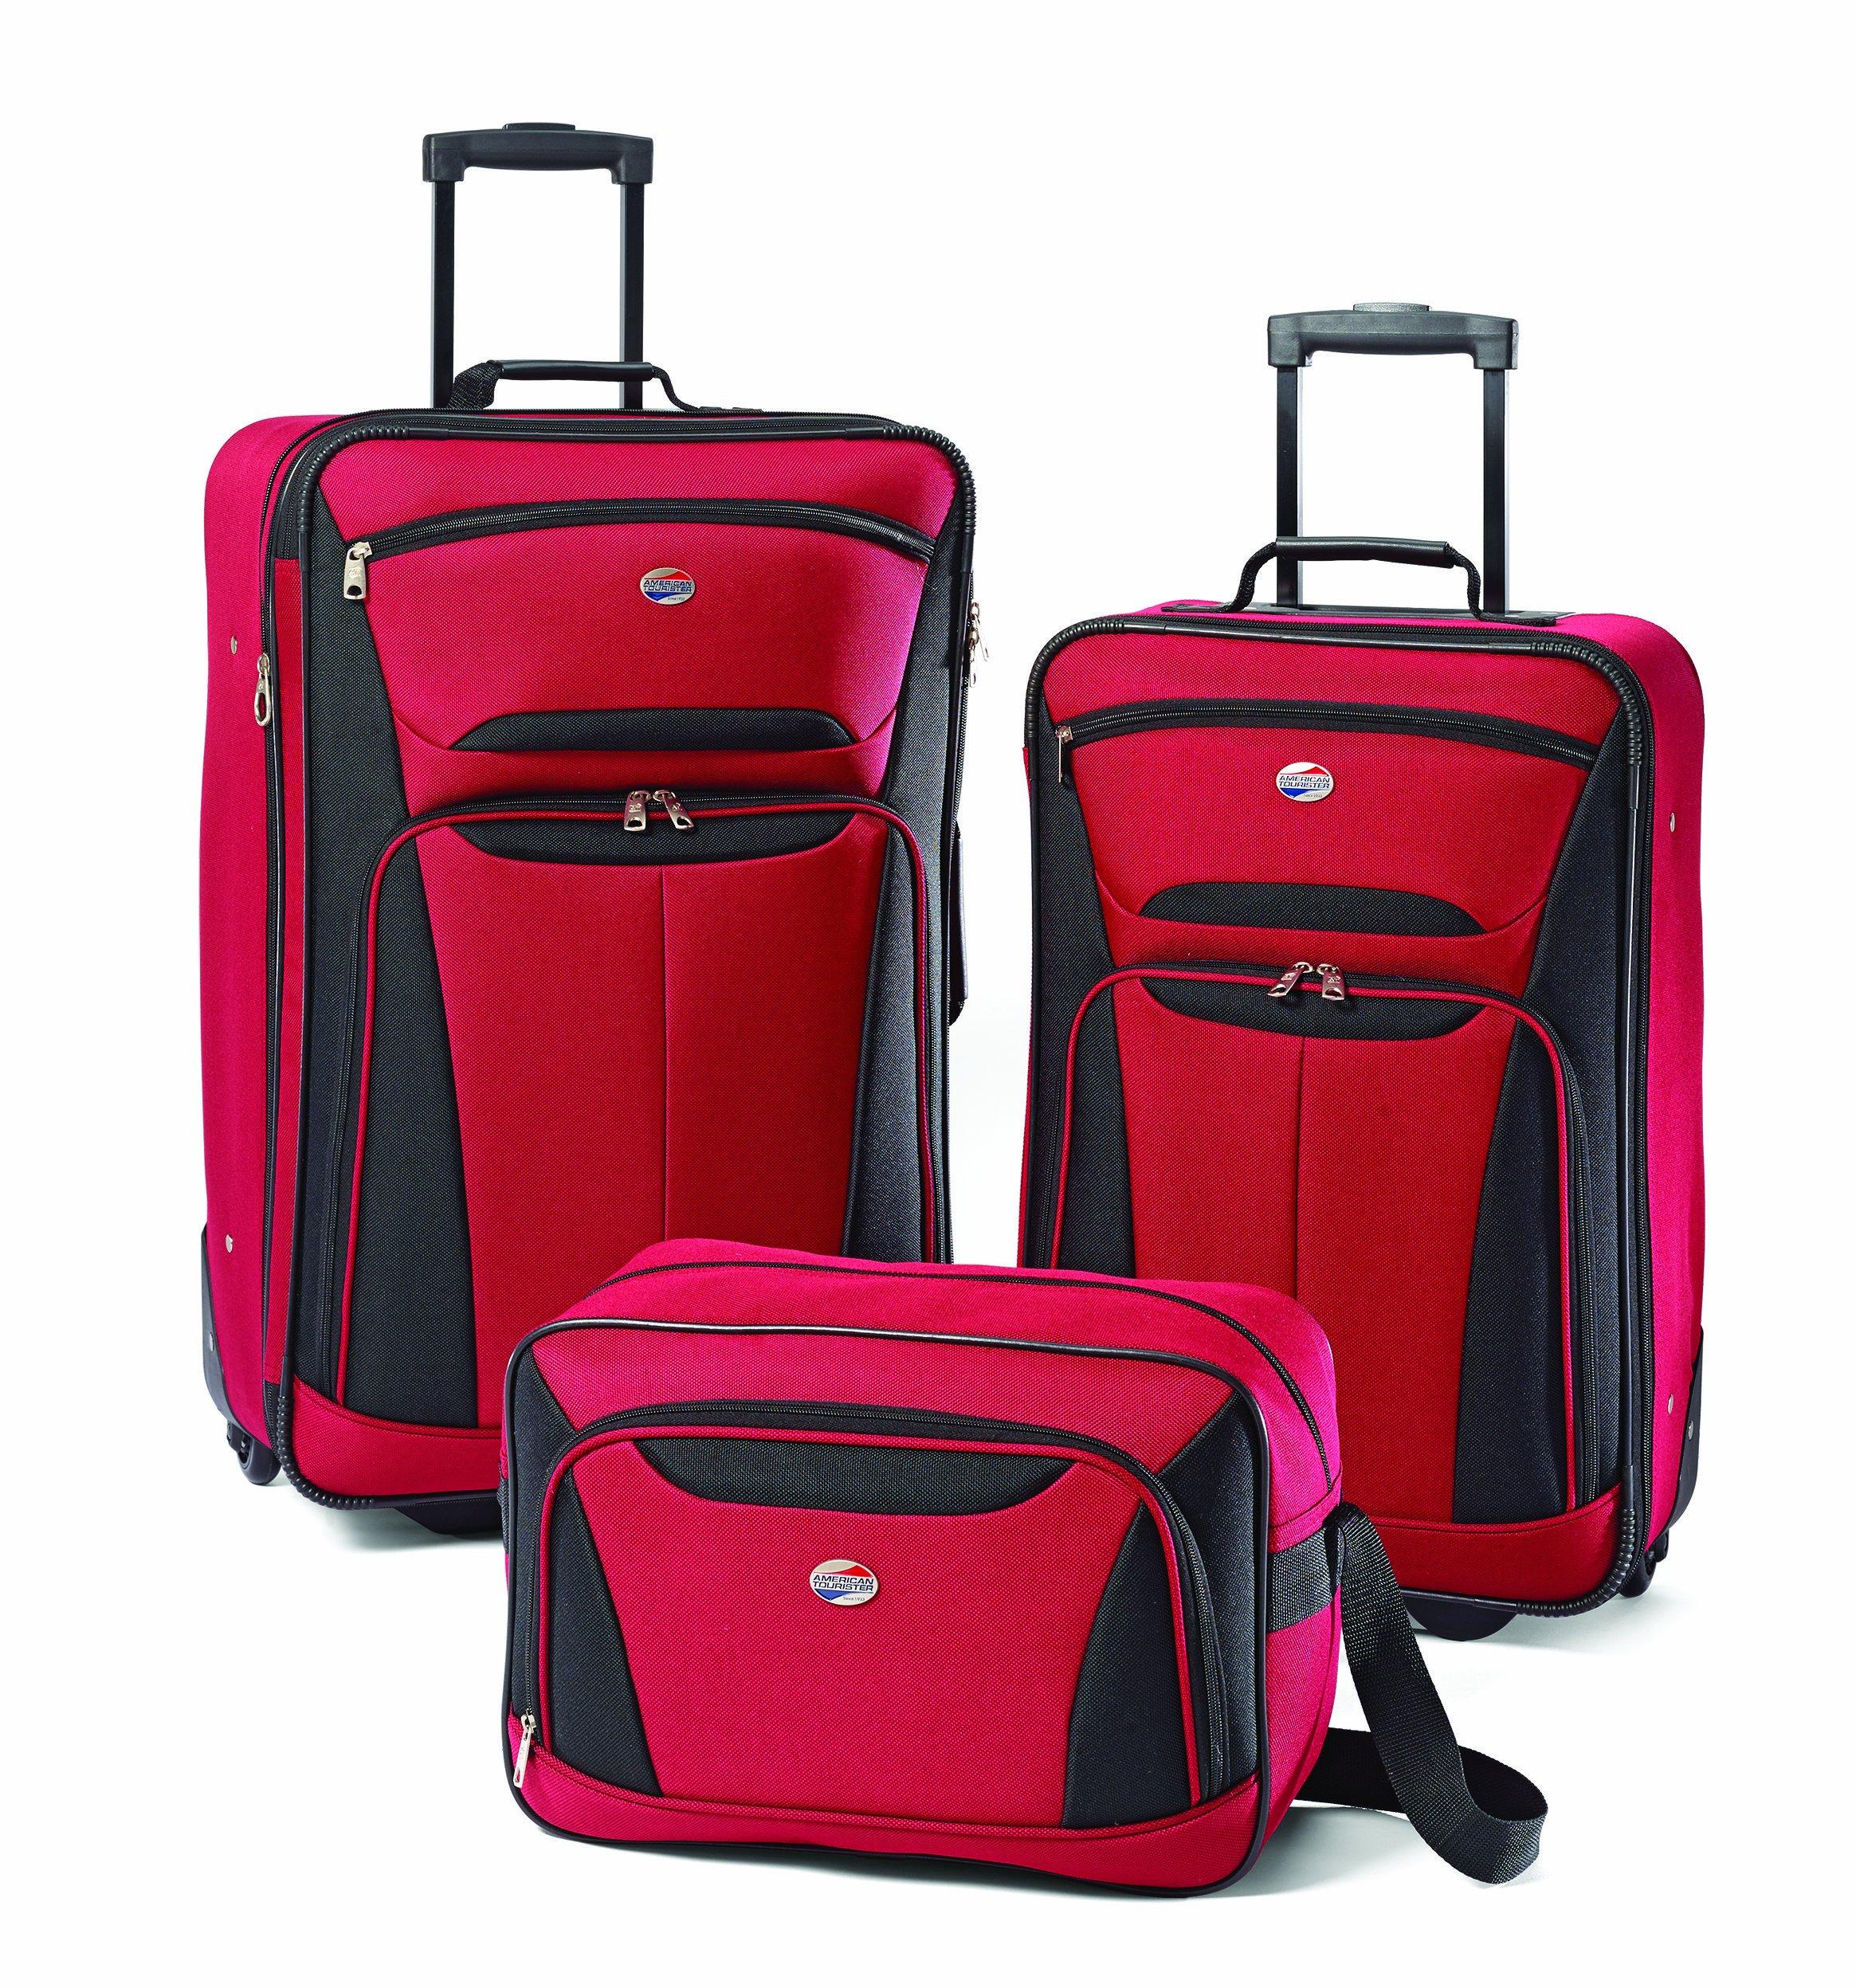 9b56dda6920a Get Quotations · American Tourister Luggage Fieldbrook II 3 Piece Set